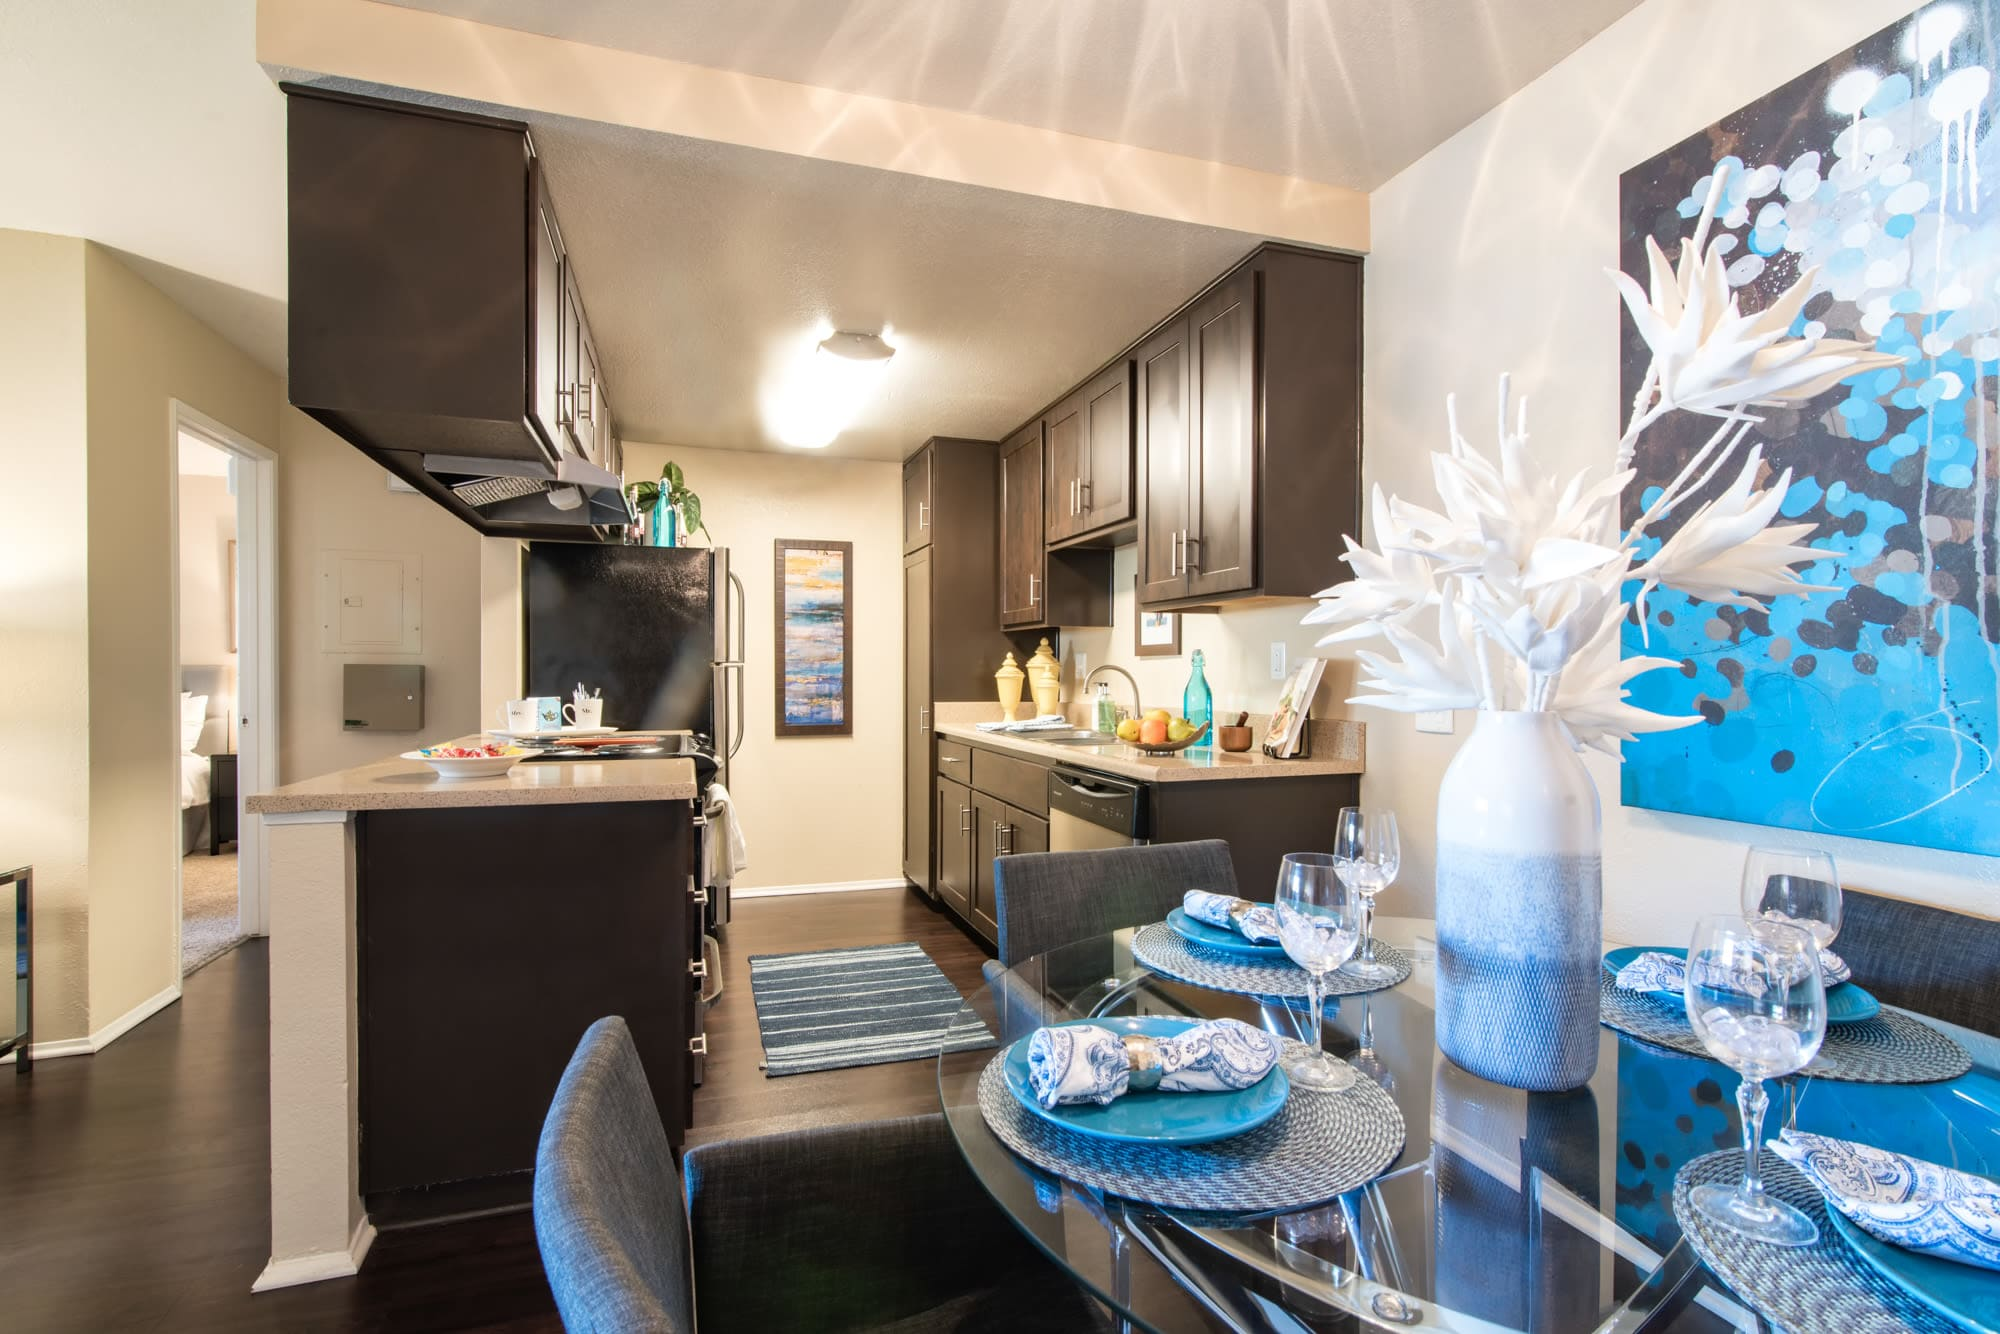 Well Decorated Apartment Interior at Terra Nova Villas in Chula Vista, CA